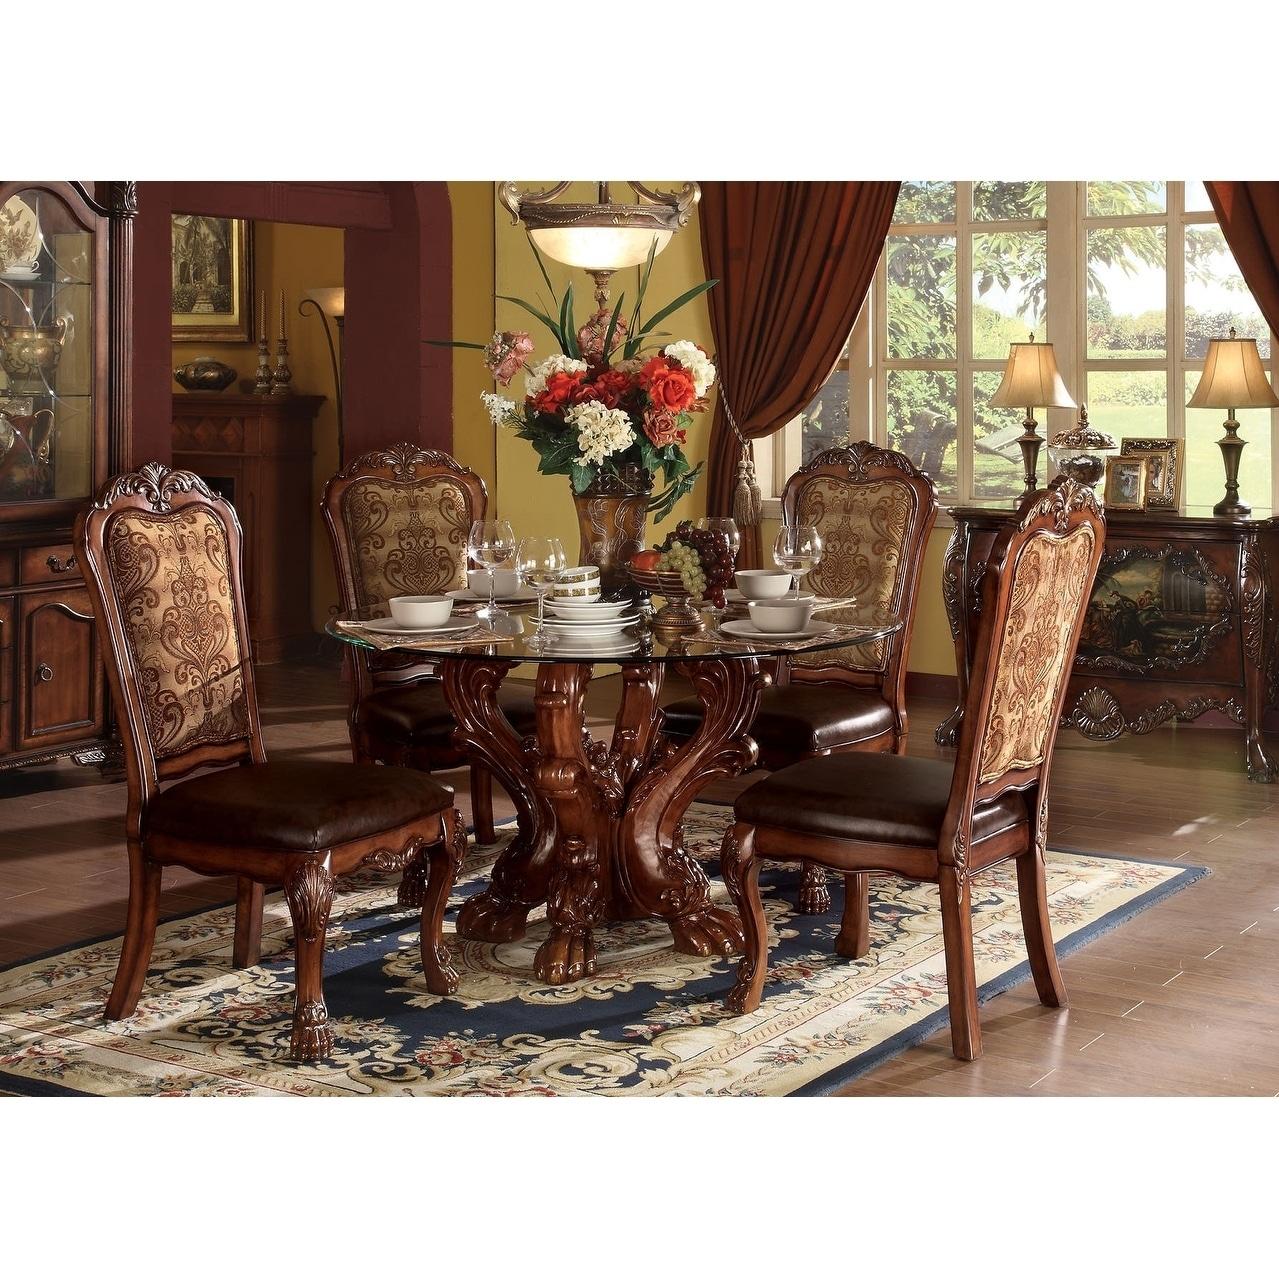 ACME Dresden Dining Table w/Pedestal, Cherry Oak 9Set/9Ctn ...